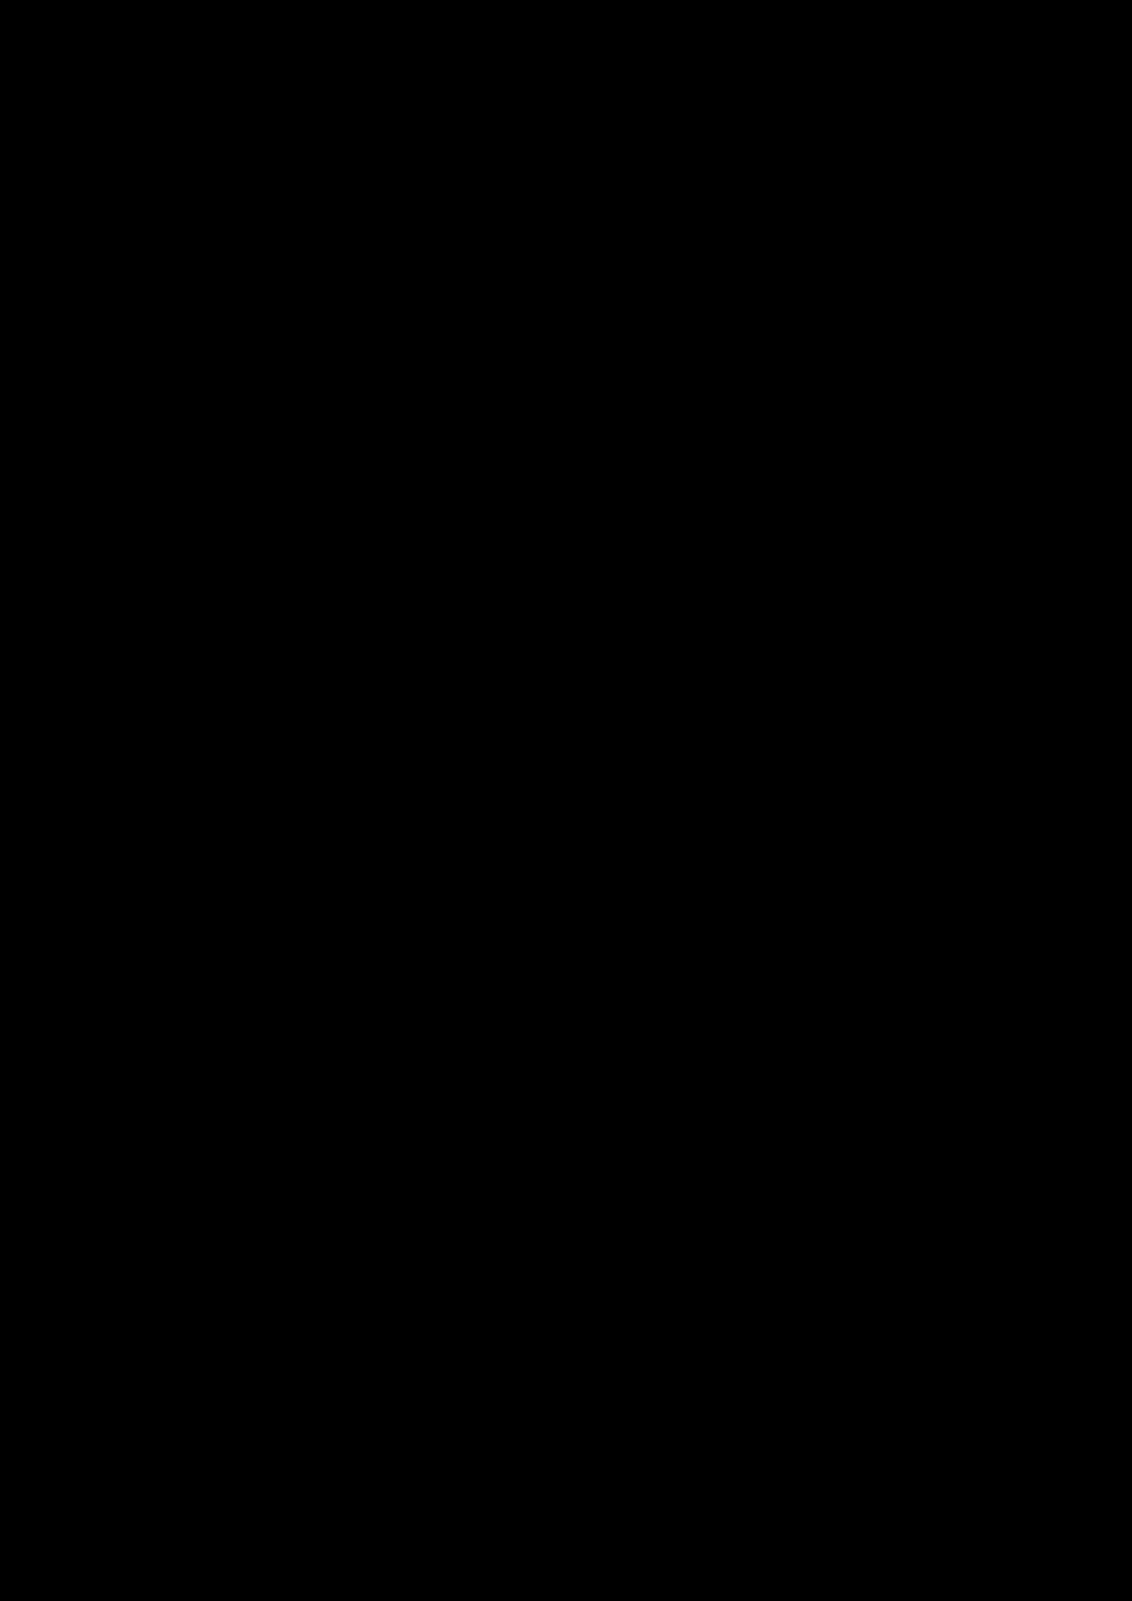 Romans o sleze slide, Image 42